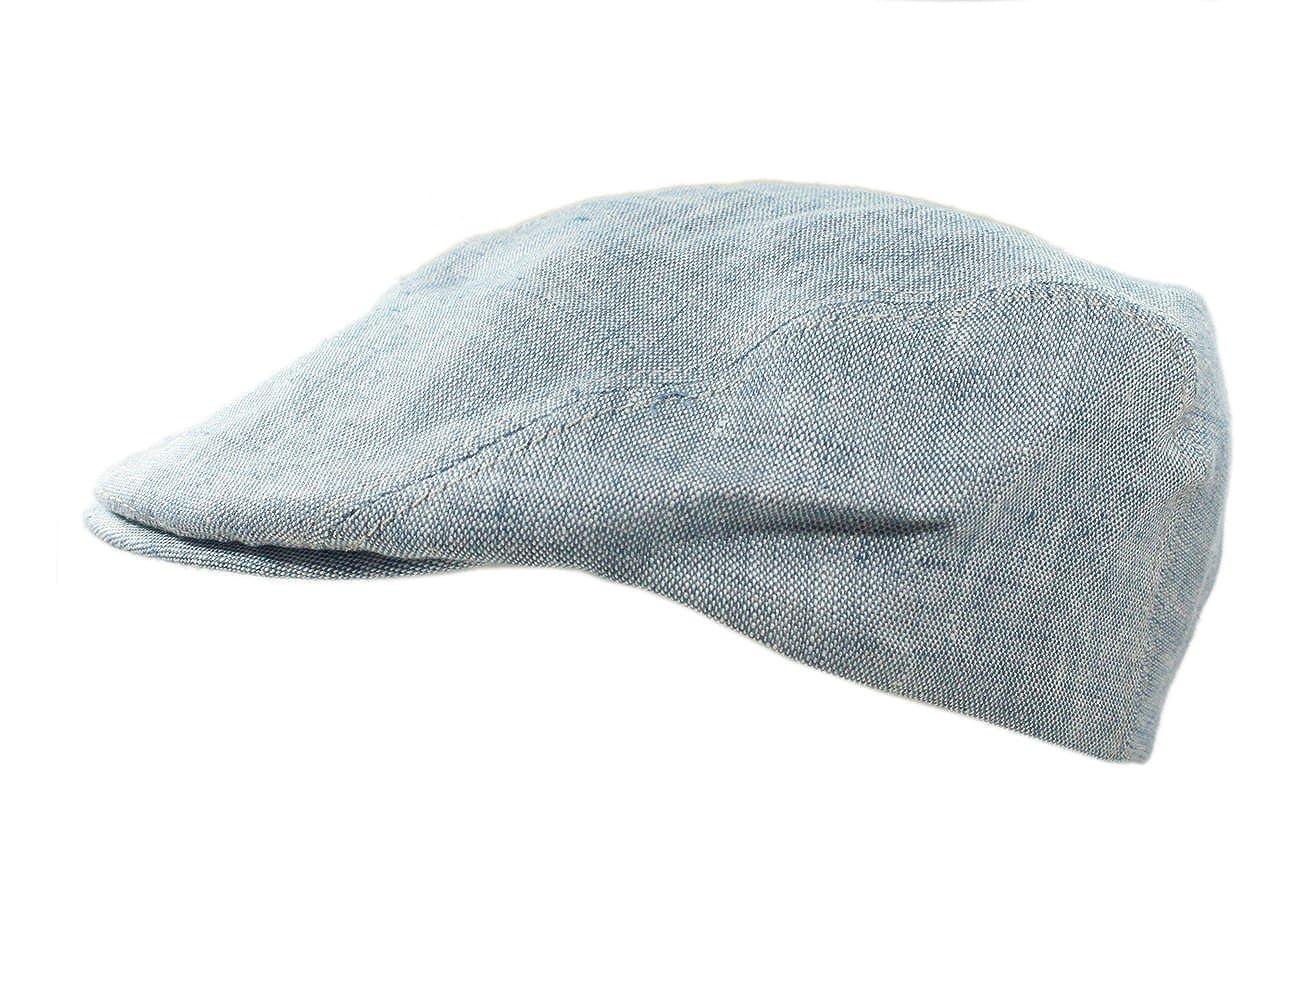 e4eea3b65c6 Biddy Murphy Mens Flat Irish Hat Linen Three Panel Made in Ireland at  Amazon Men s Clothing store